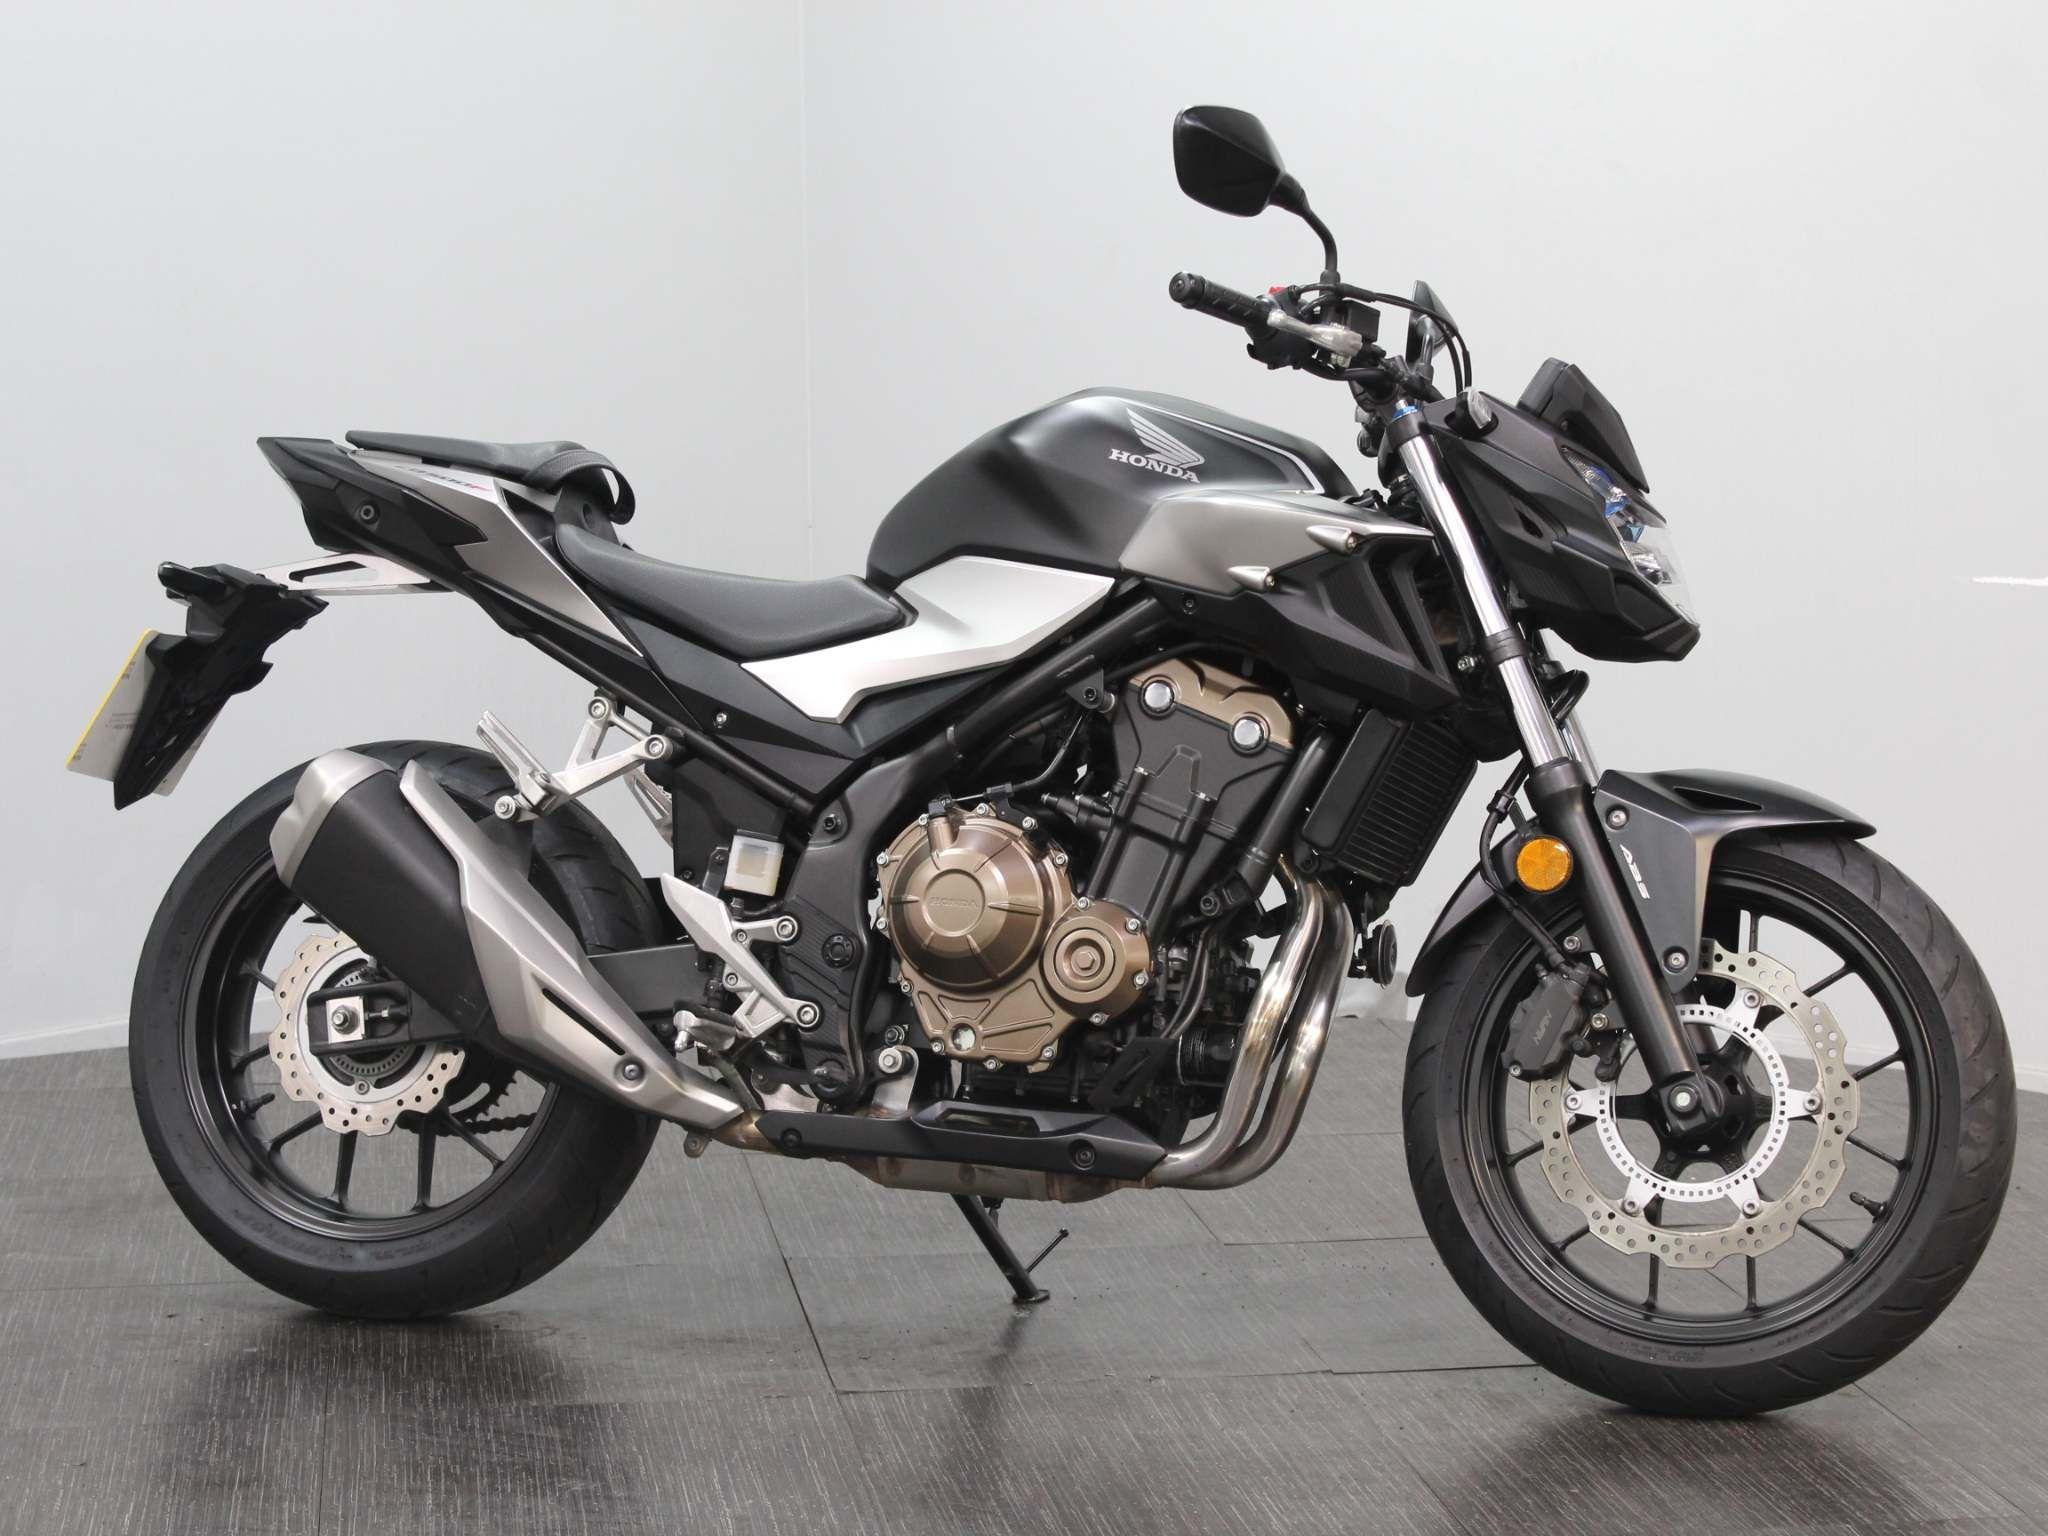 Honda CB500 Images